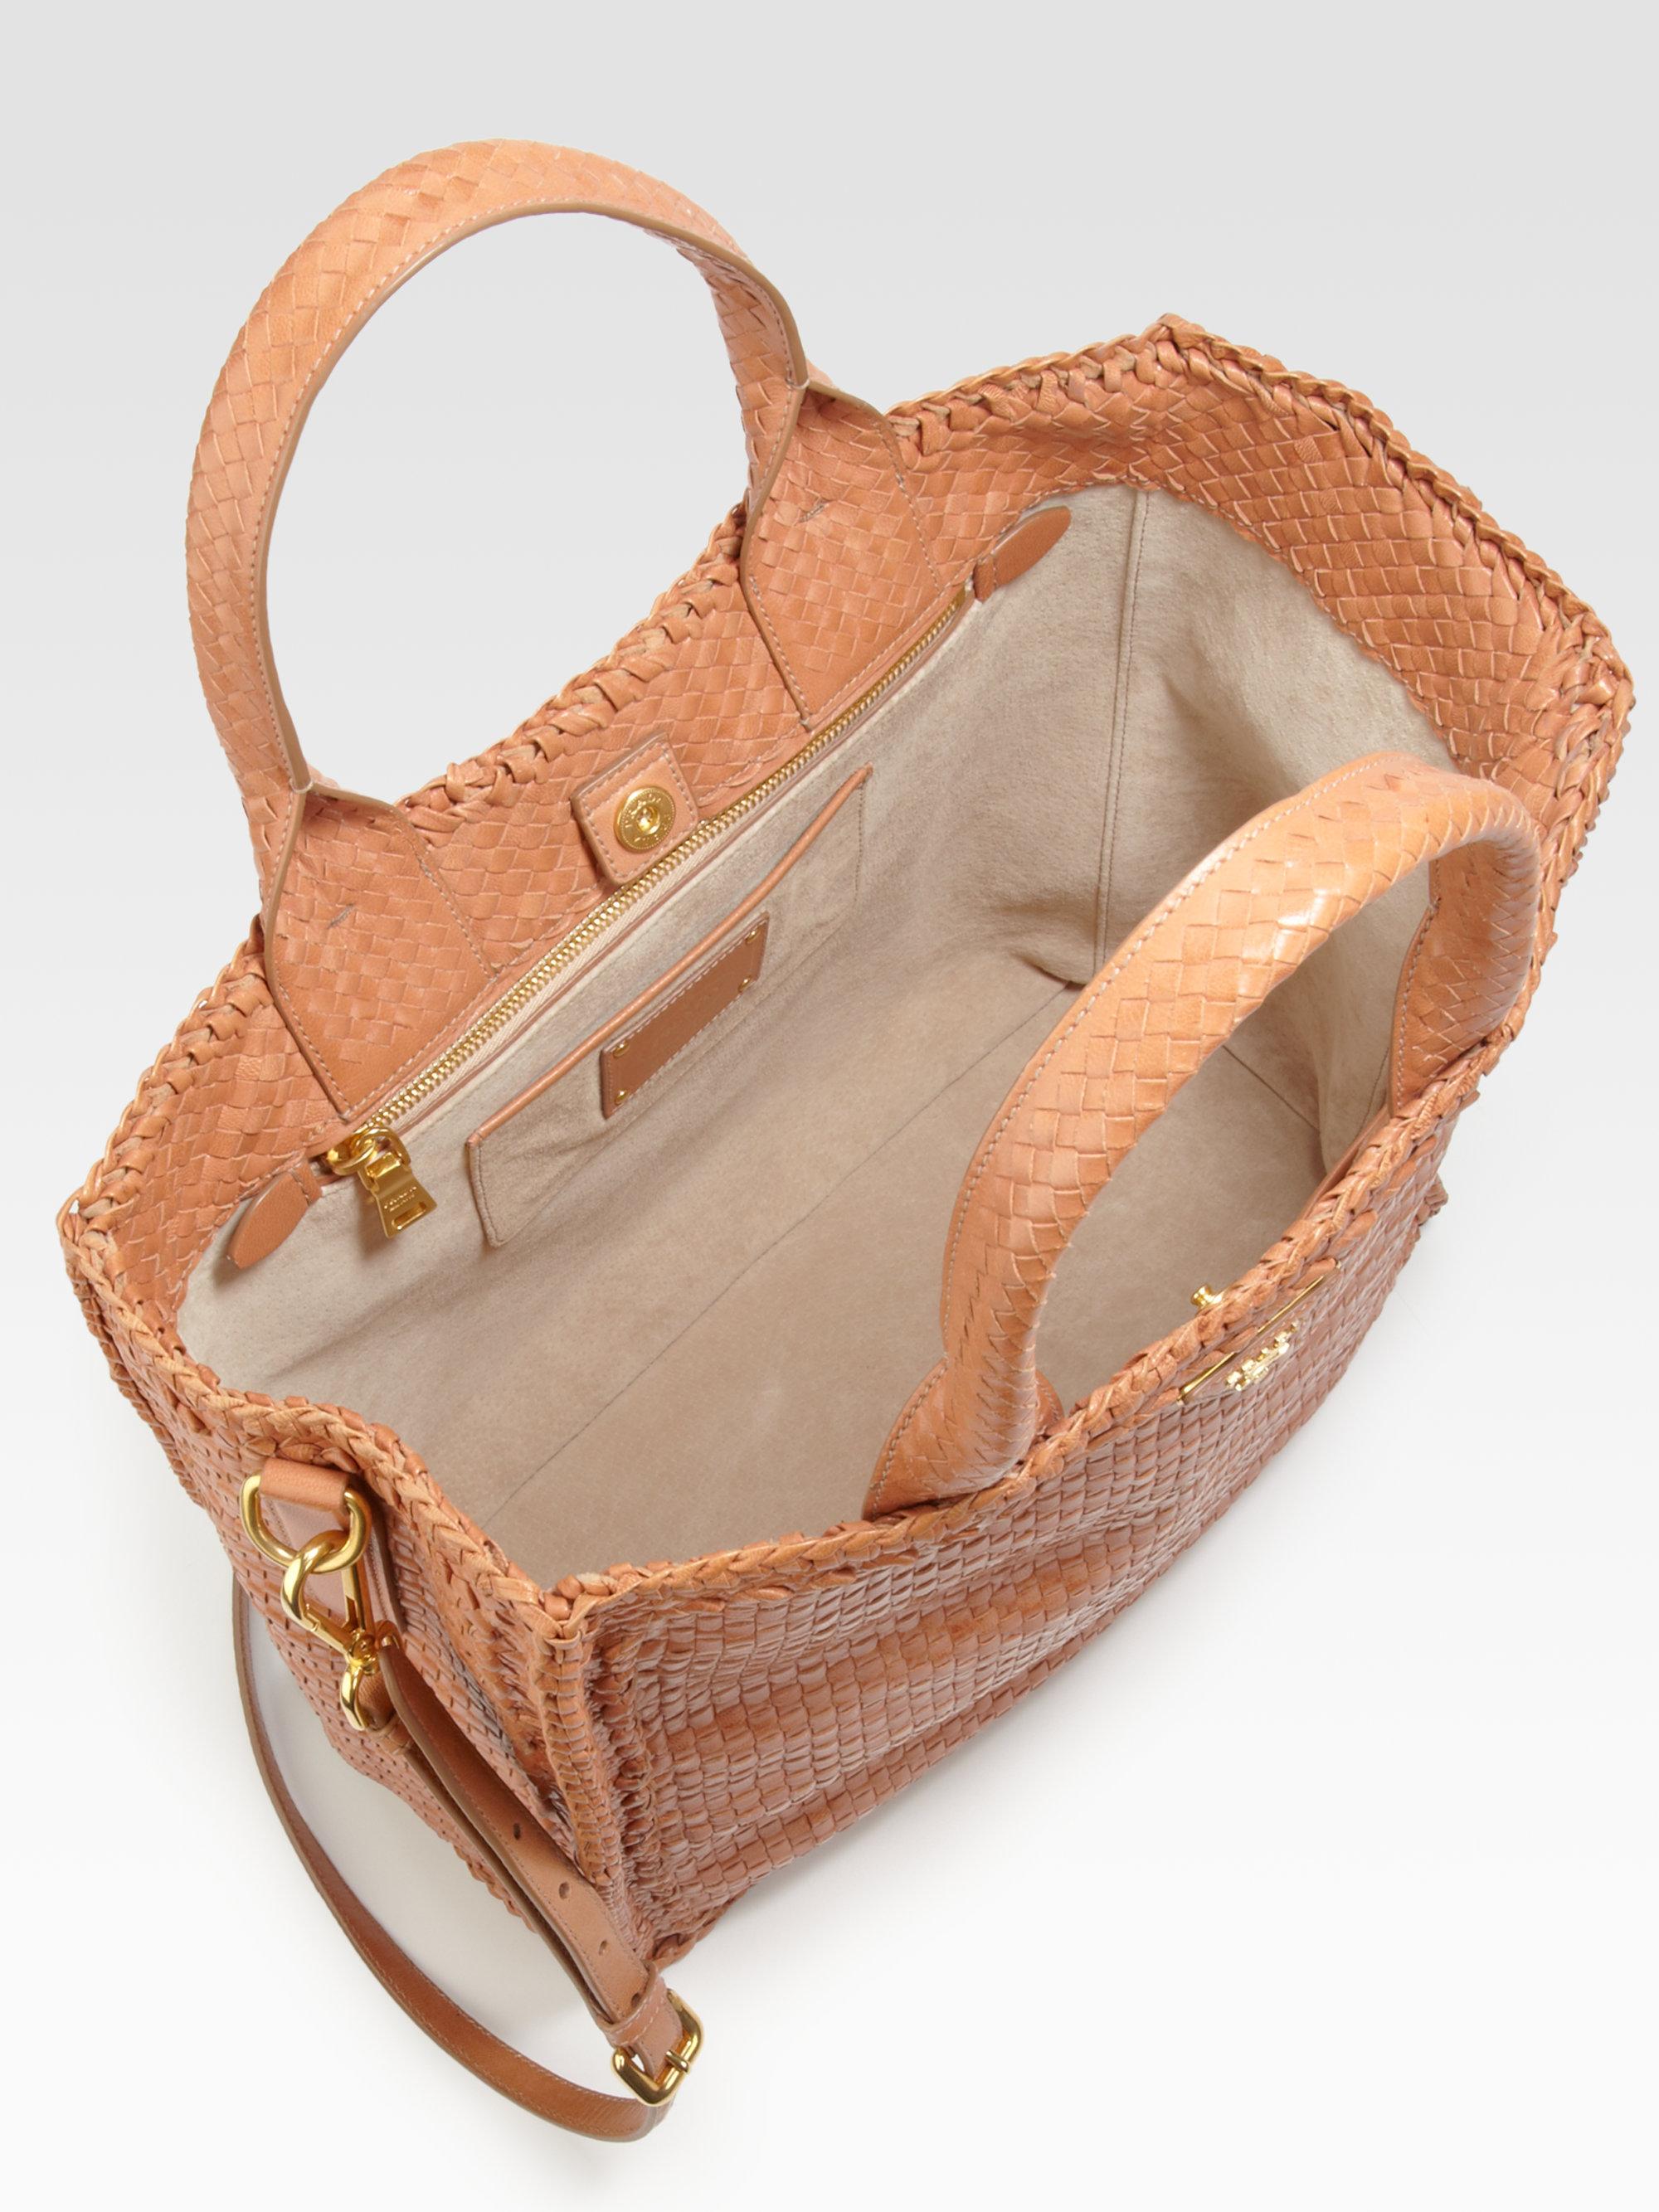 Prada Madras Woven Leather Tote Bag in Orange (nude) | Lyst